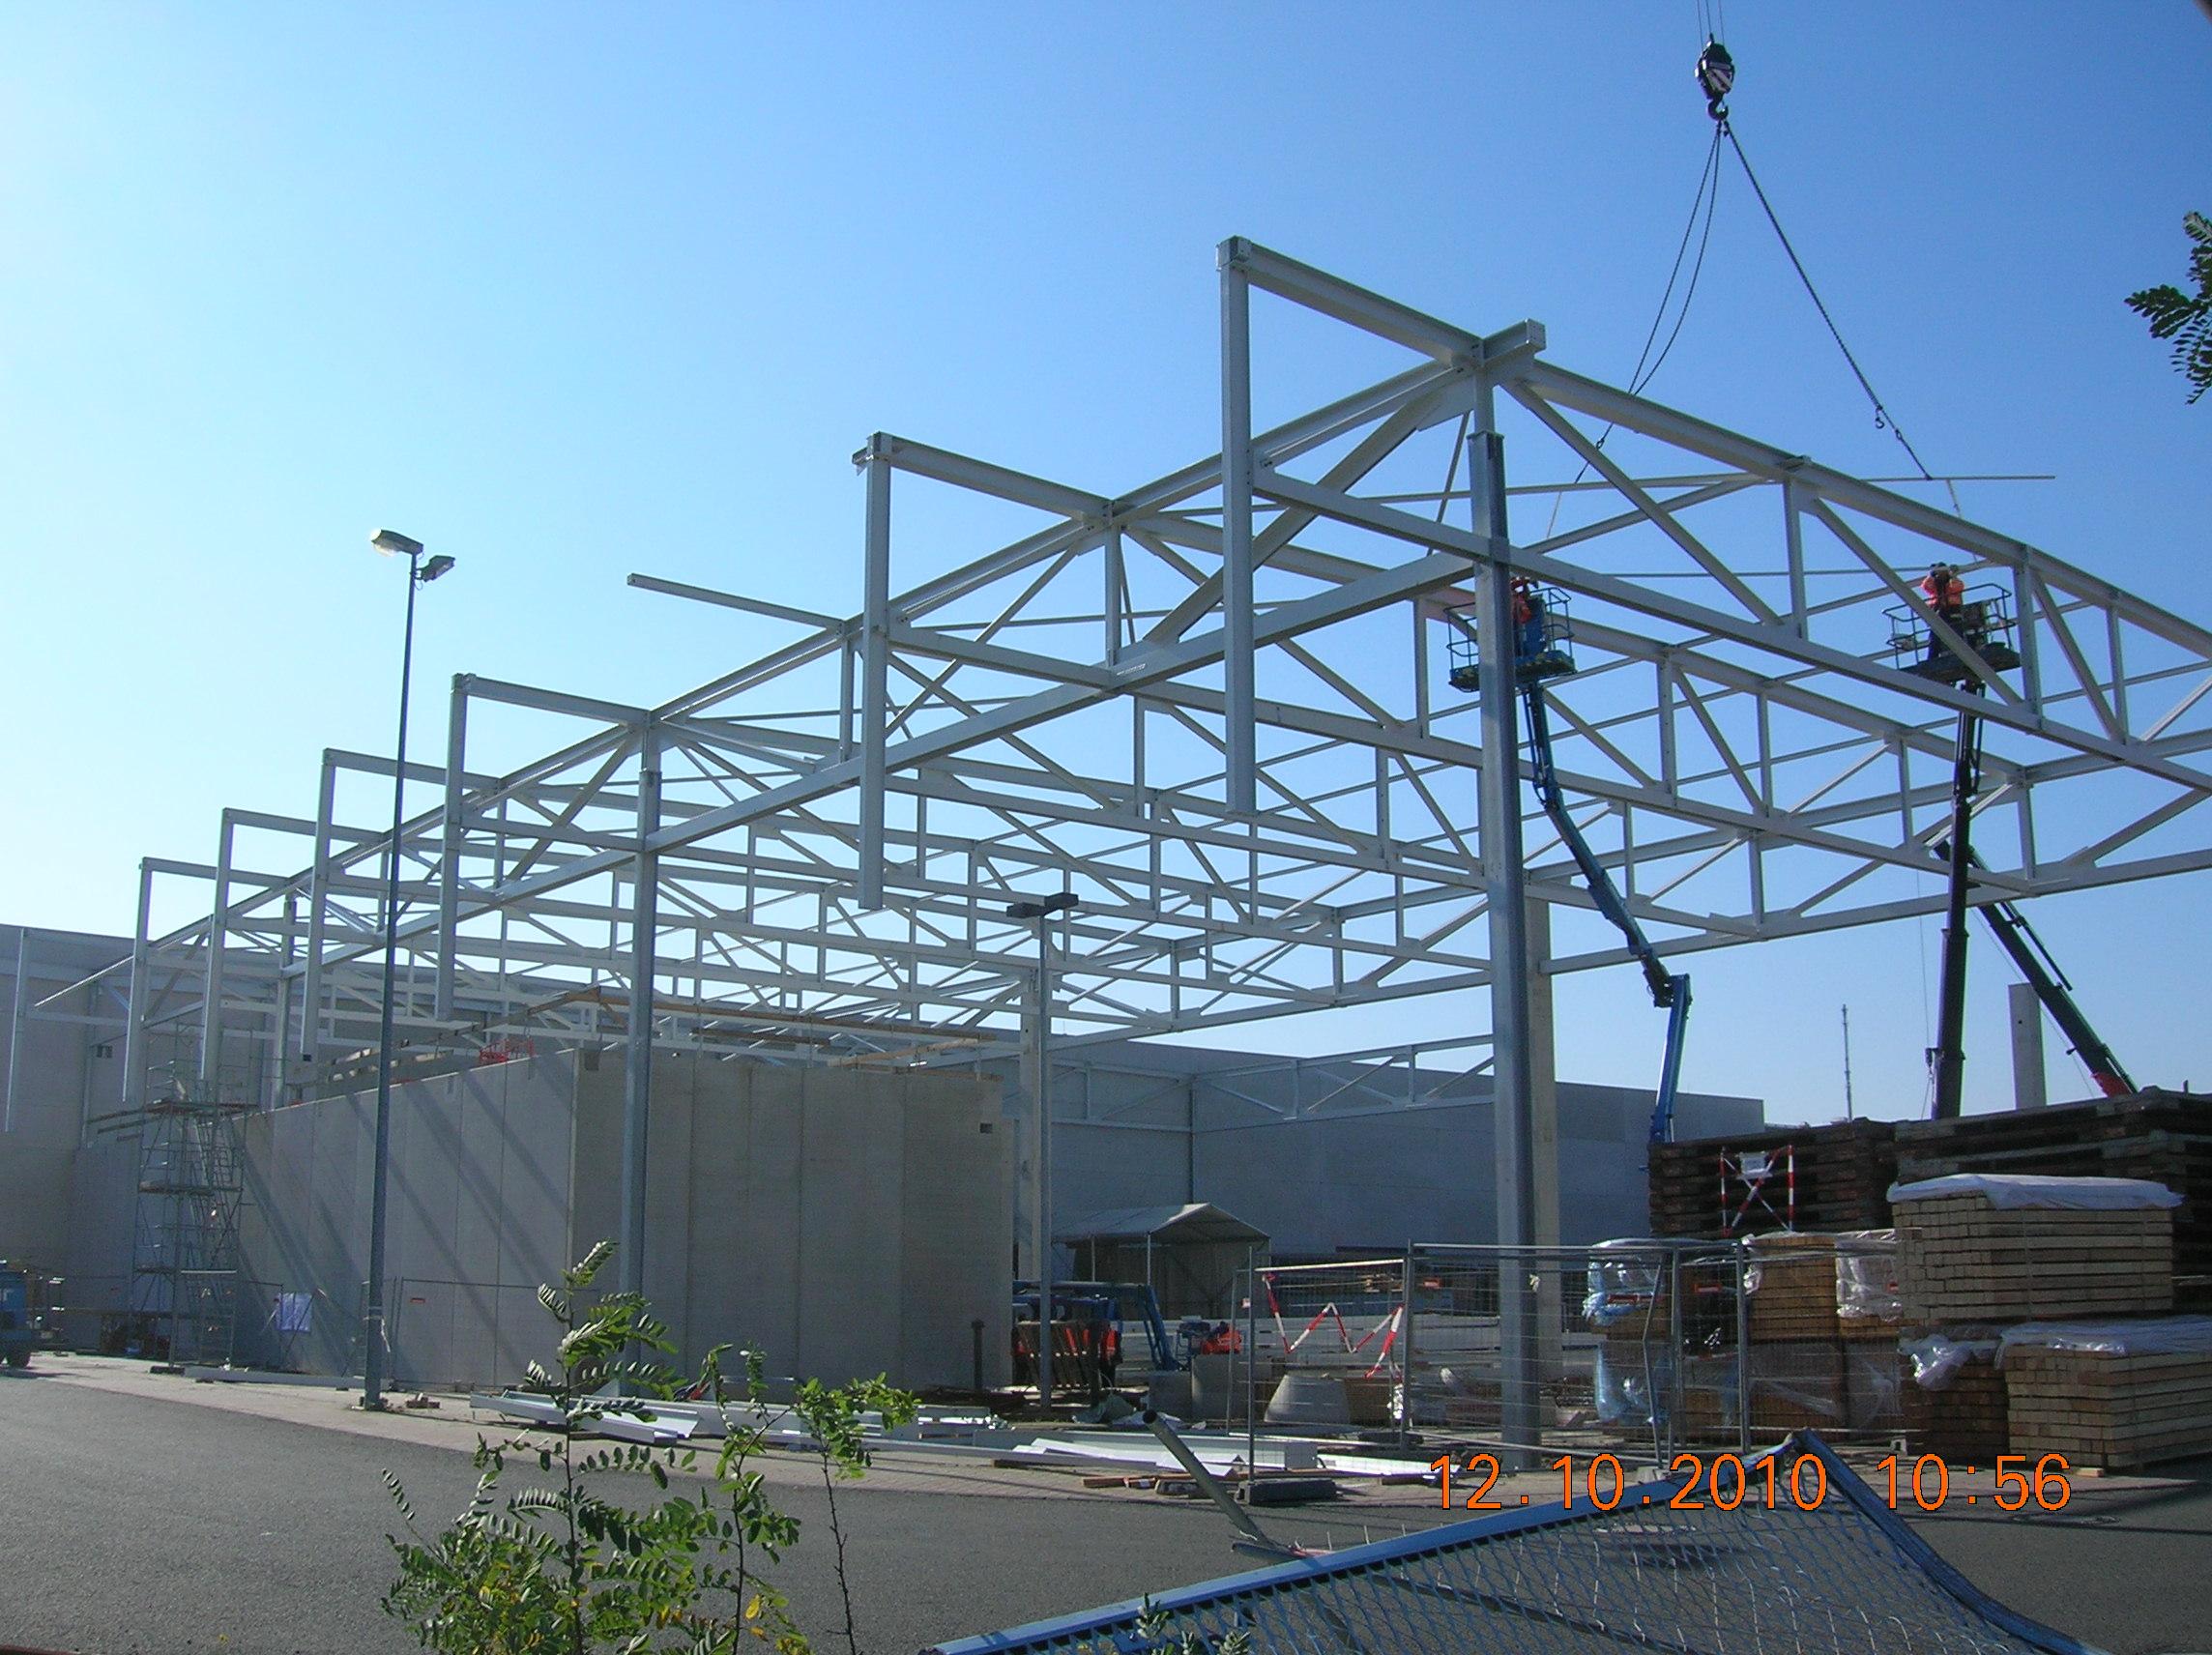 stahlkonstruktion logistikhalle stahlbau n gele